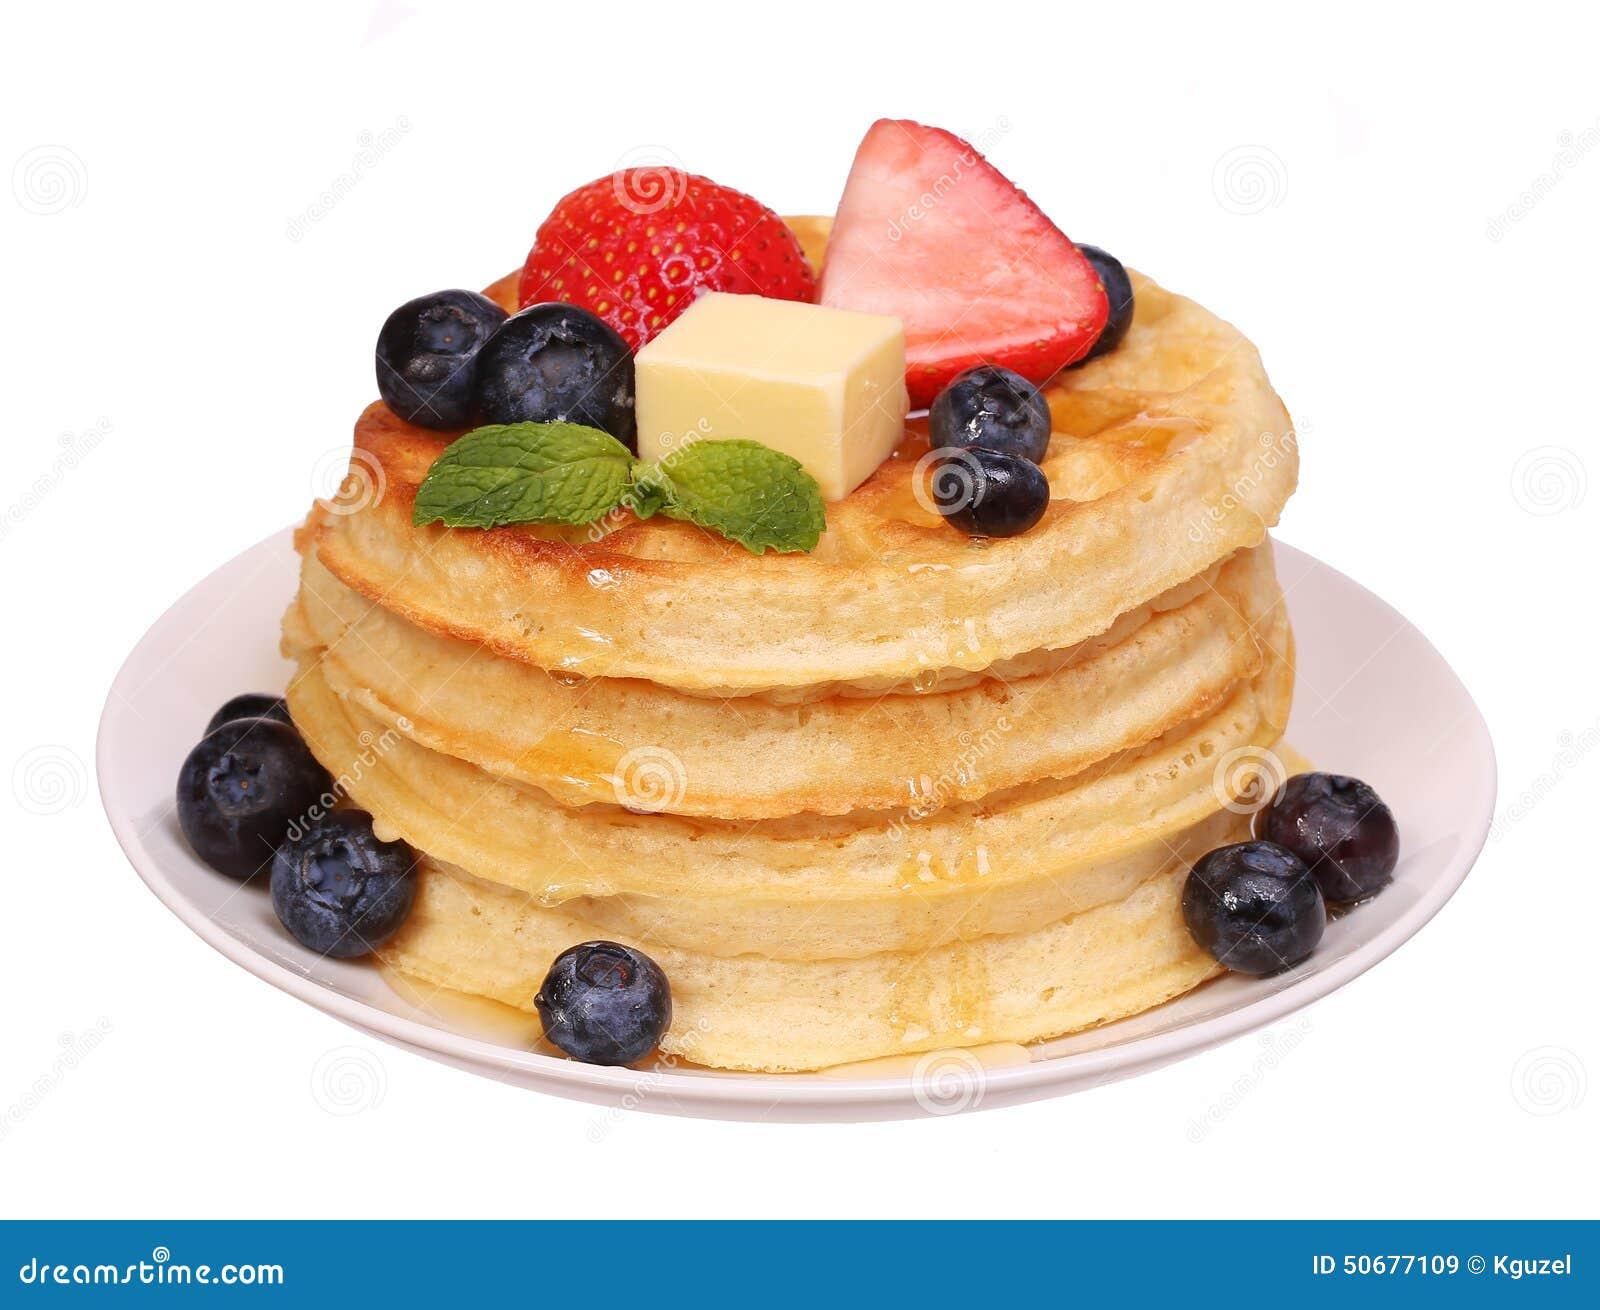 Download 奶蛋烘饼用被隔绝的草莓和蓝莓 库存图片. 图片 包括有 快餐, 槭树, 奶蛋烘饼, 可口, 美食, 蜂蜜 - 50677109